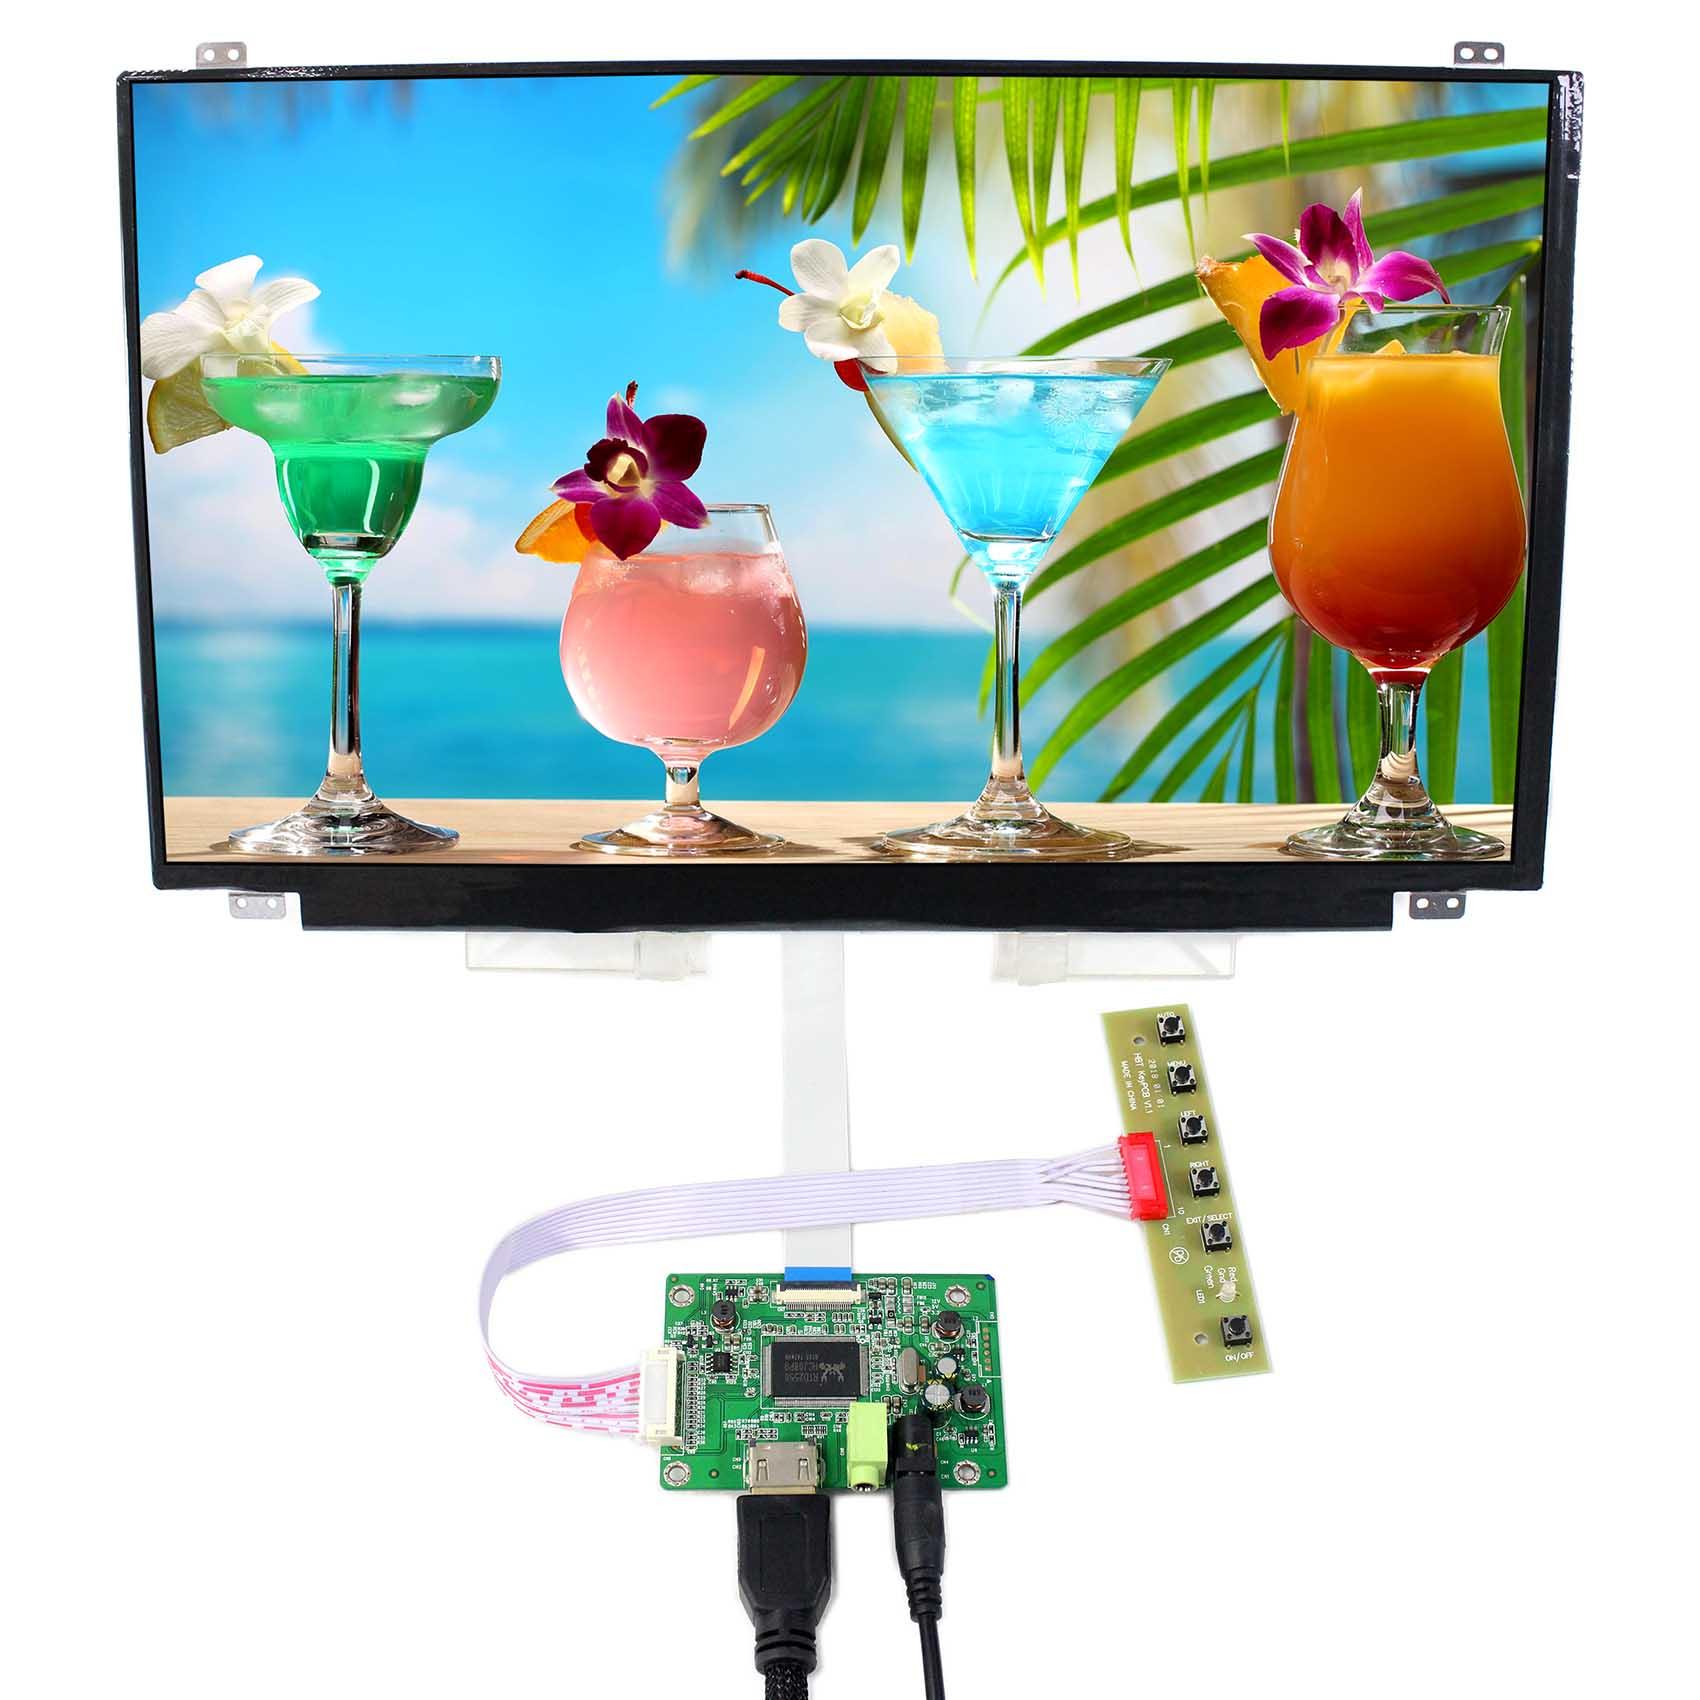 "15.6 polegada 1920x1080 IPS tela LCD (um de 15.6 ""B156HAN01.0 B156HAN01.1 B156HAN01.2) trabalhar com placa controladora HDMI LCD"